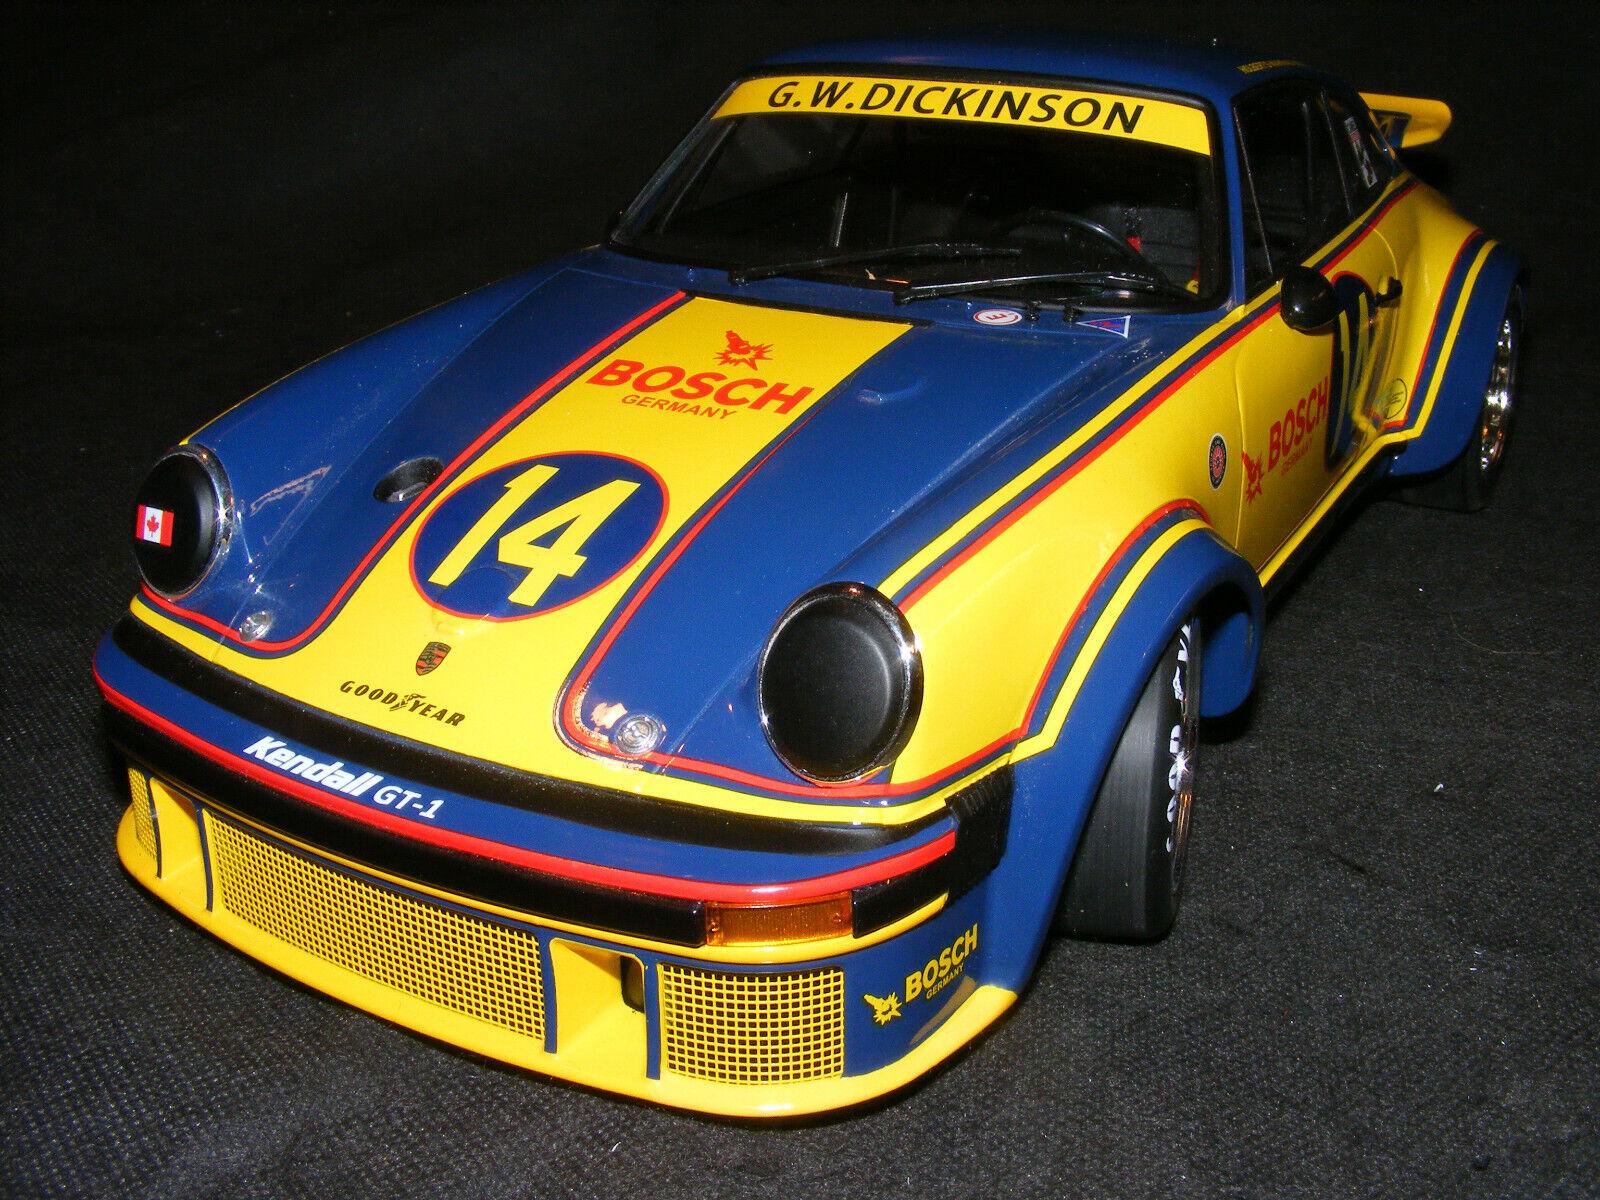 alta calidad y envío rápido Porsche 934, Grande 1 12th escala Al Holbert Holbert Holbert 1976 Minichamps.  calidad fantástica